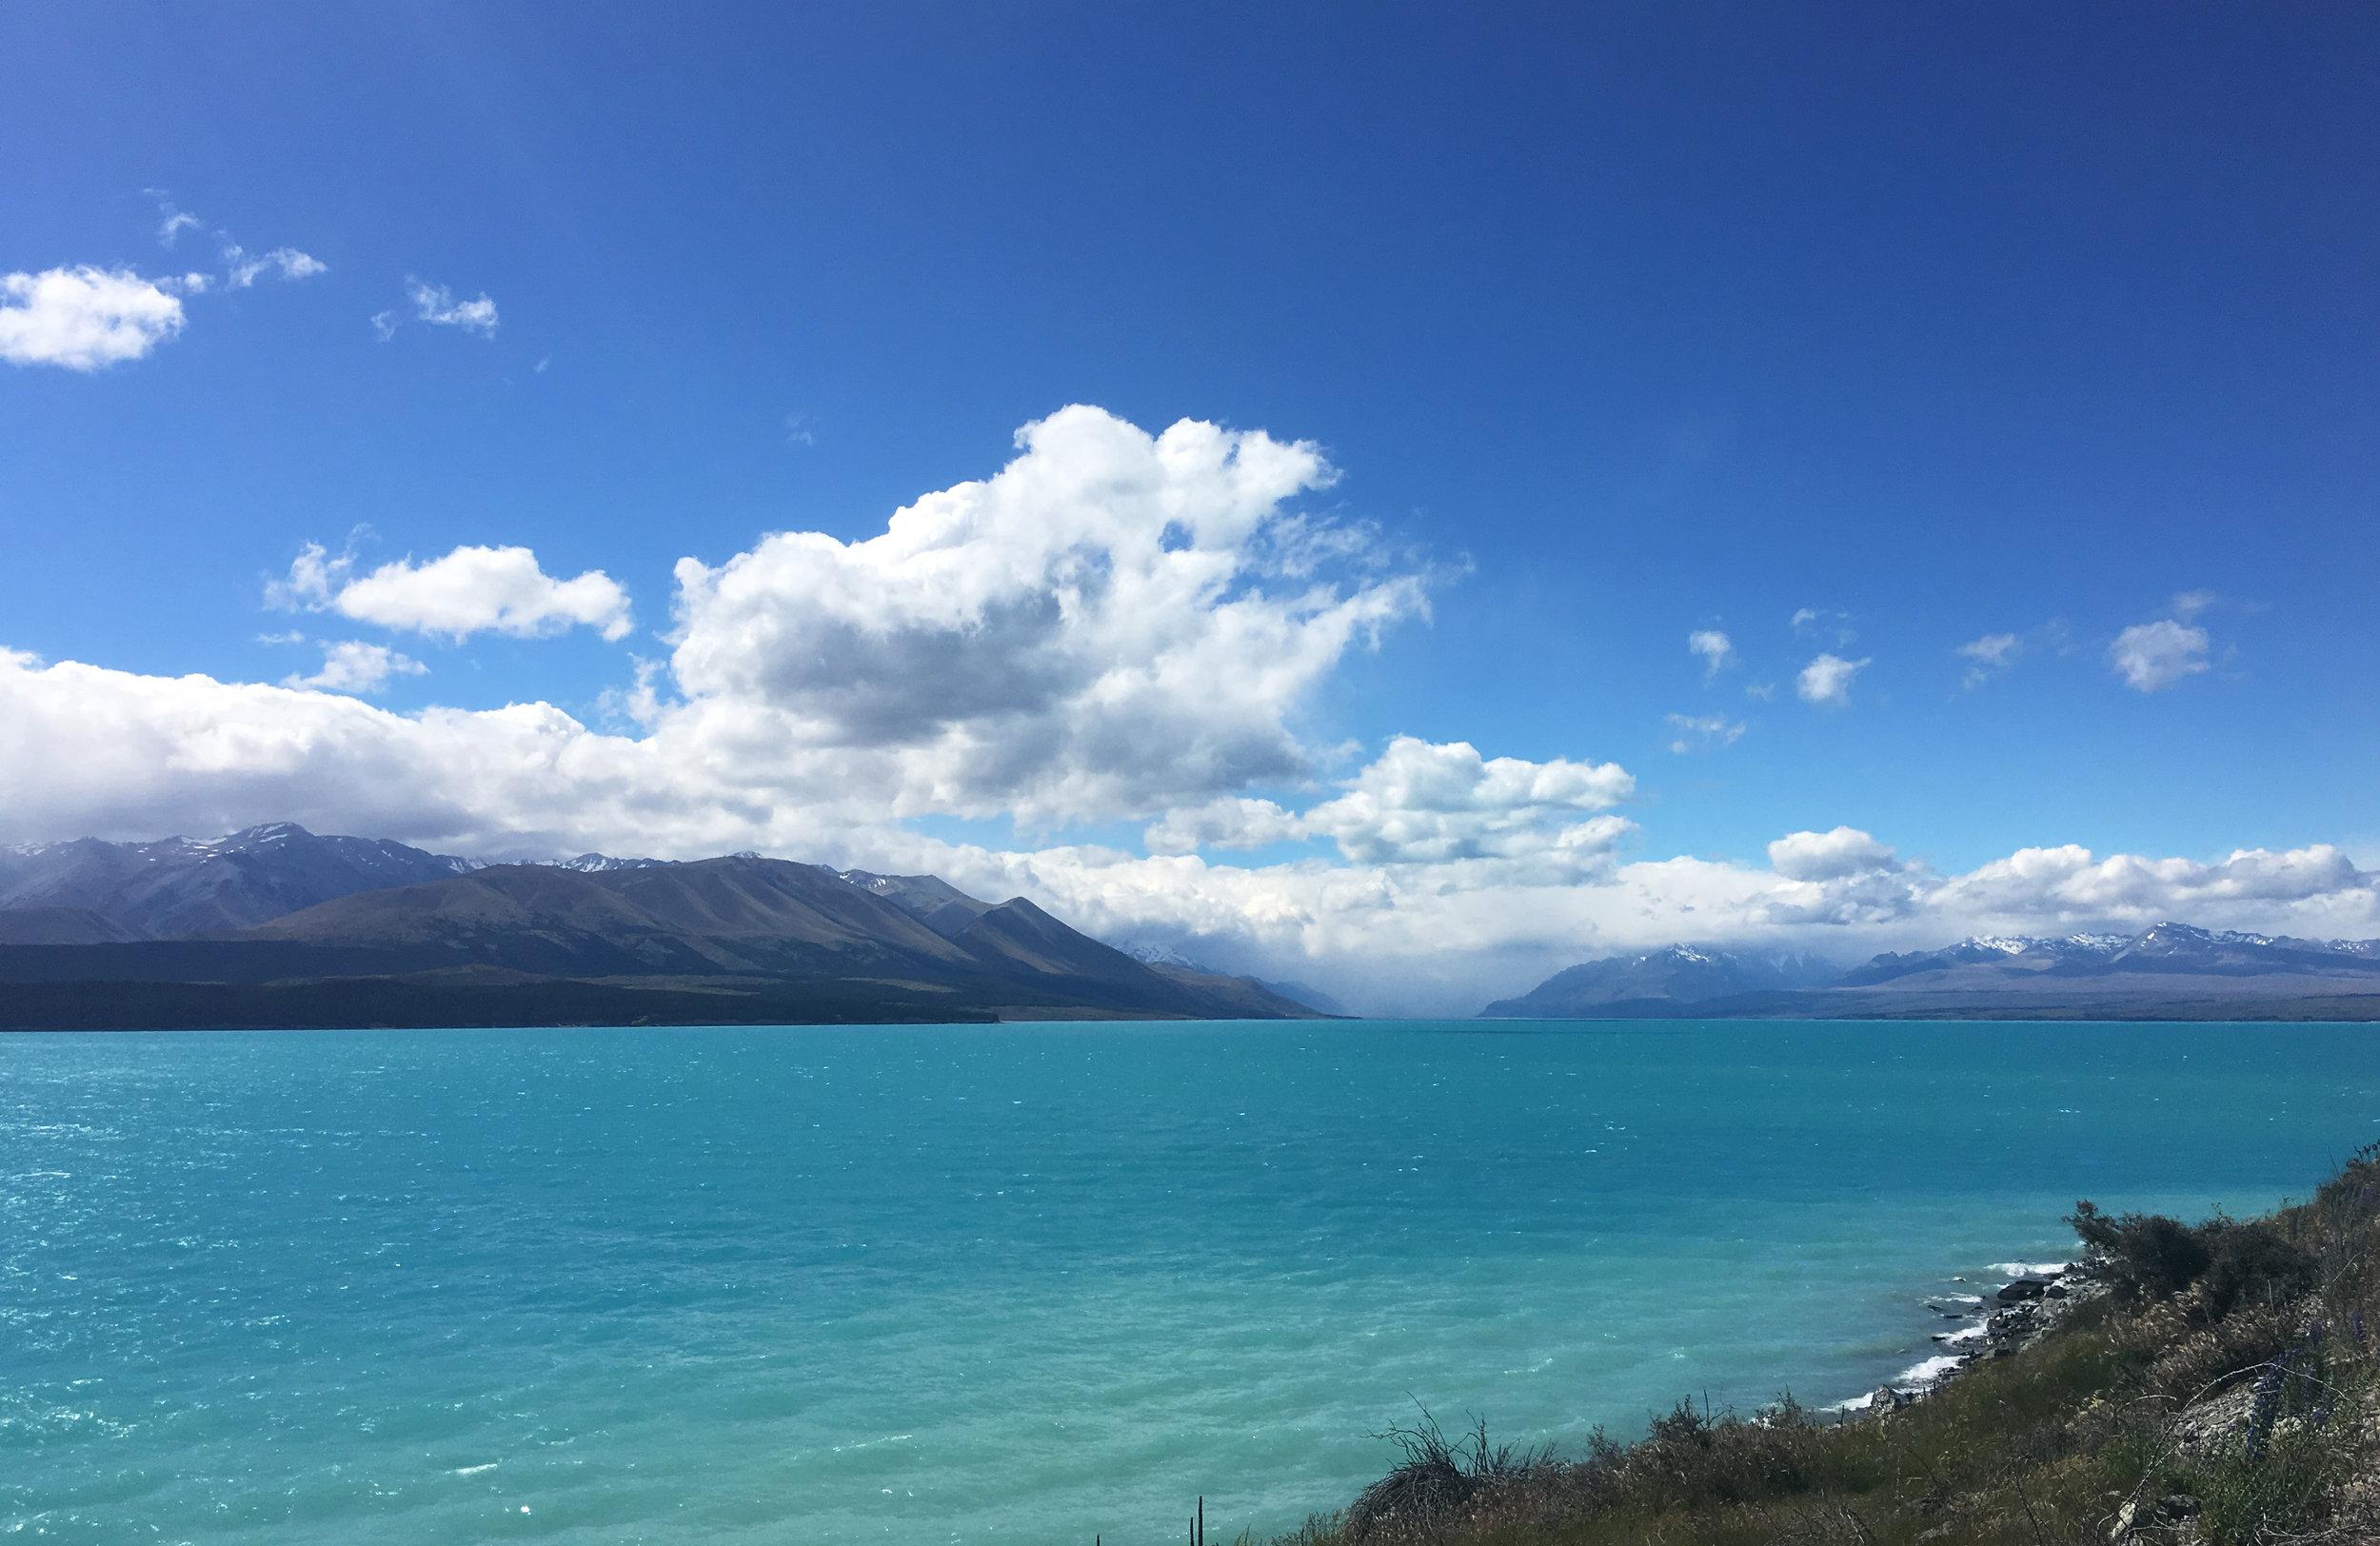 Lozidaze_NZ_Lake-Tekapo_01